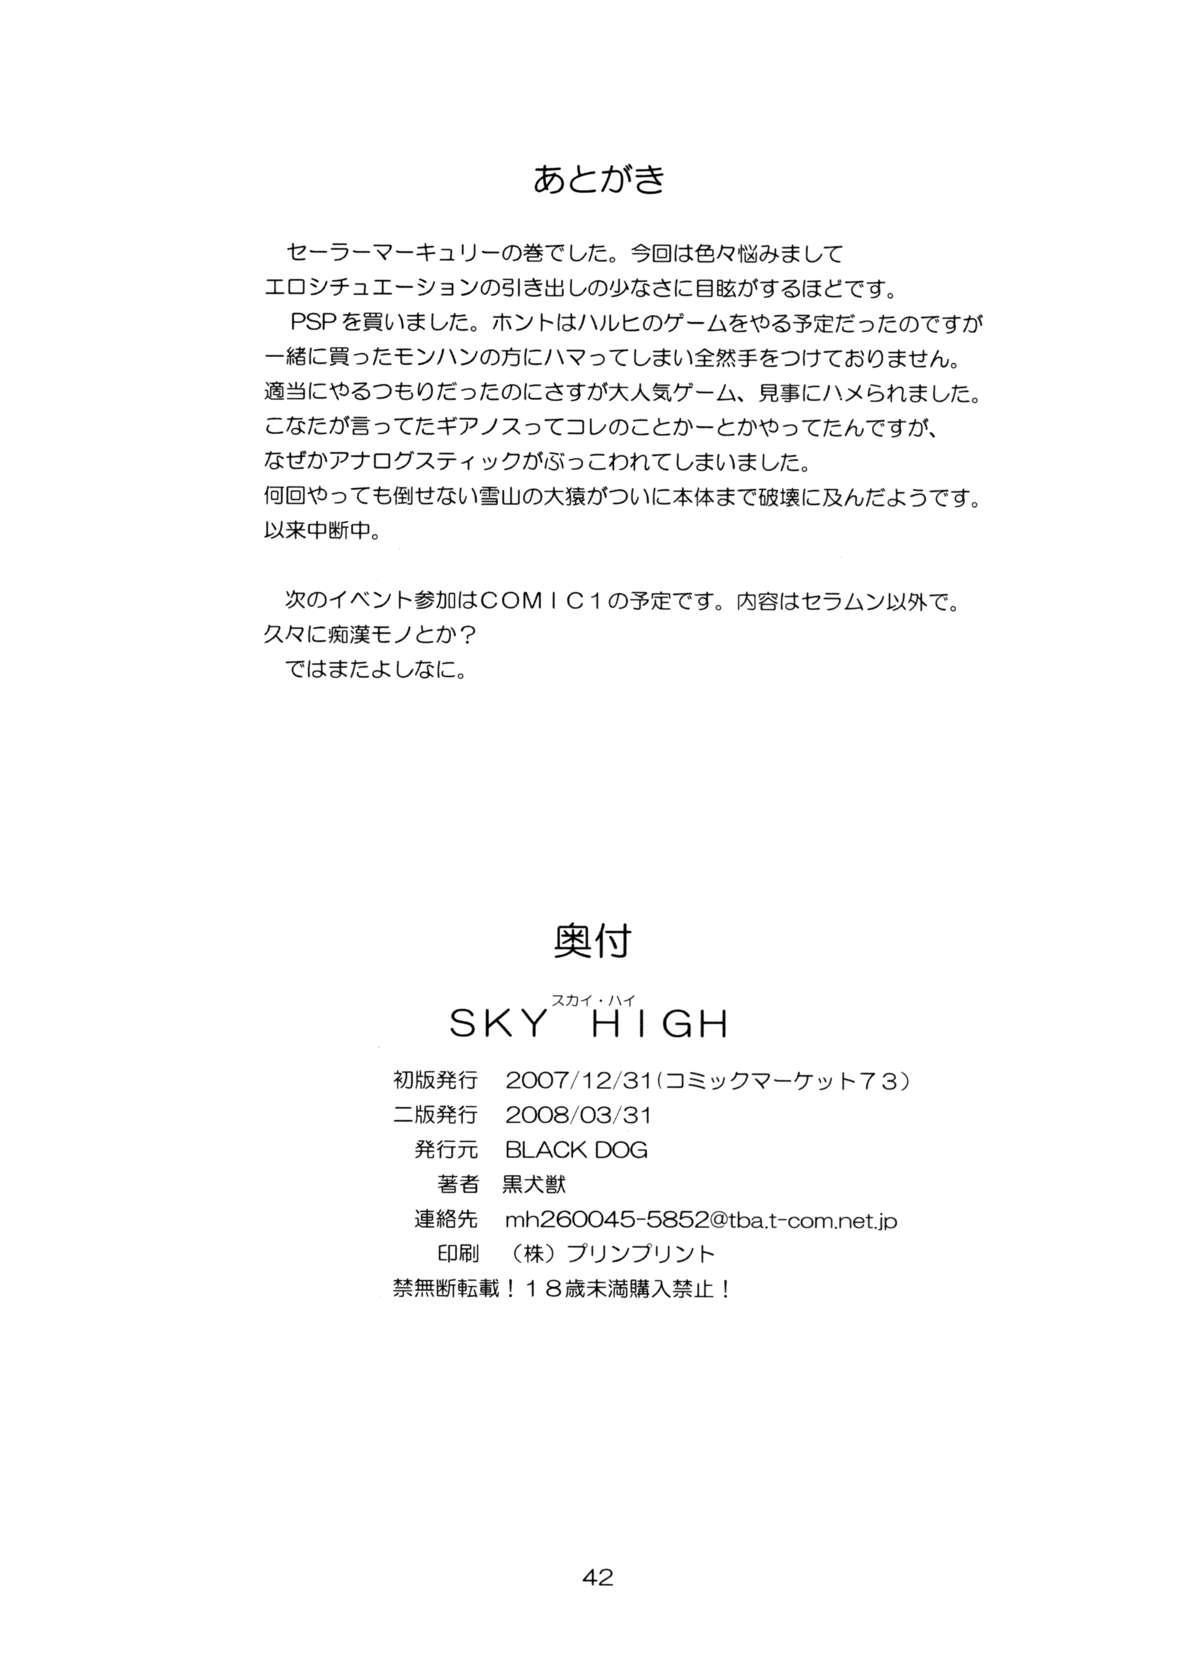 Sky High 40